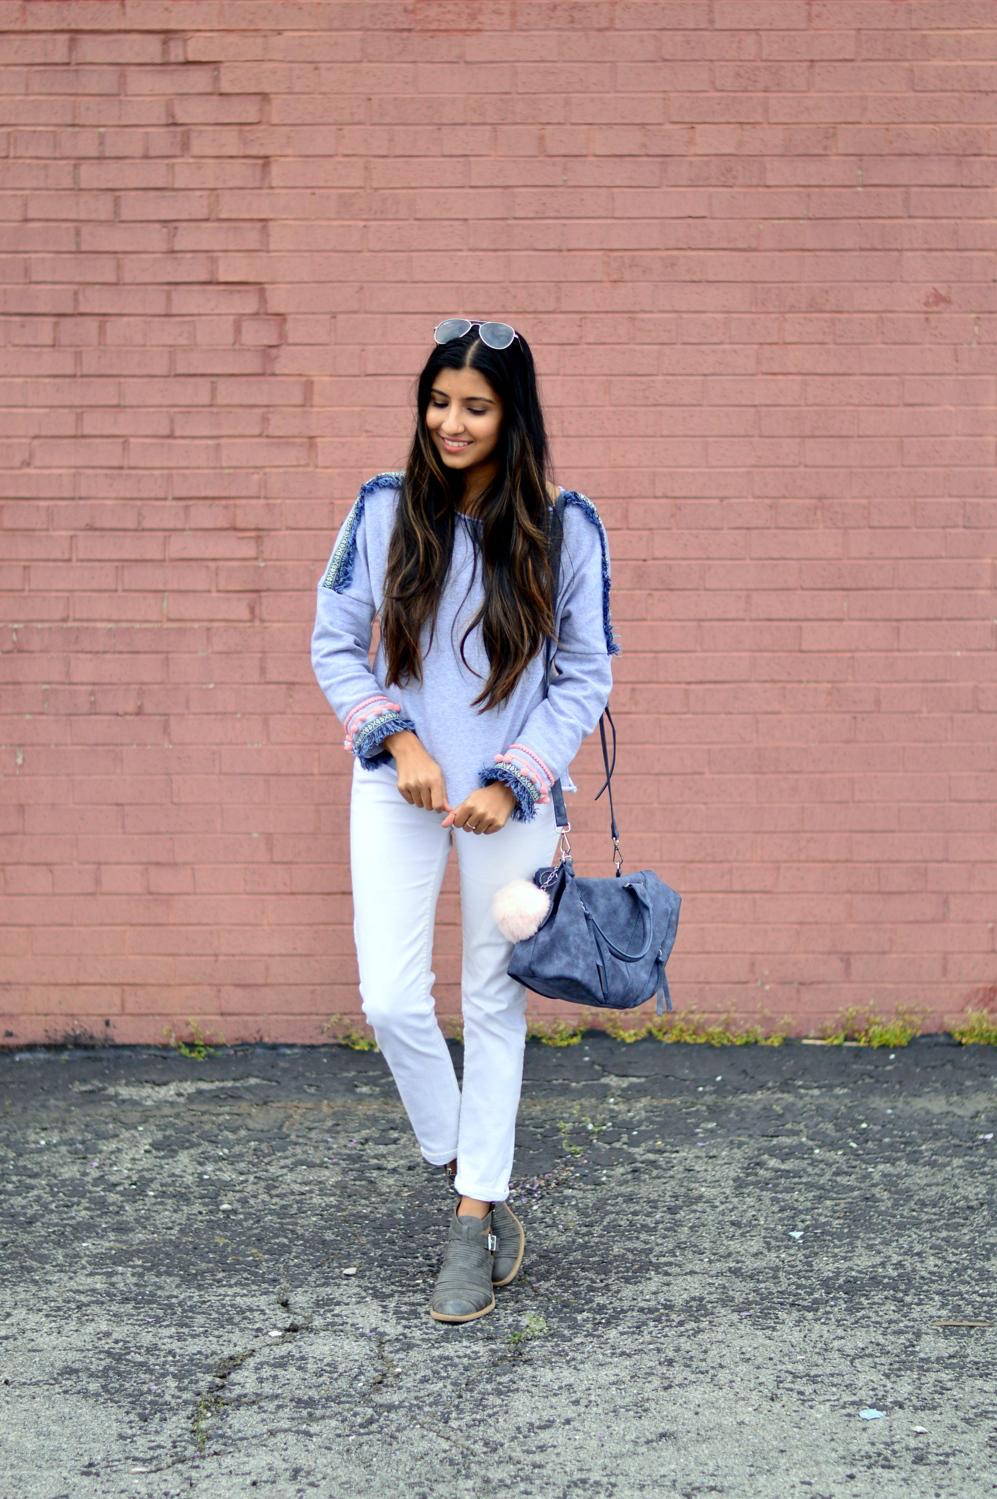 pompoms-fringe-sweatshirt-causal-basics-blogger-outfit